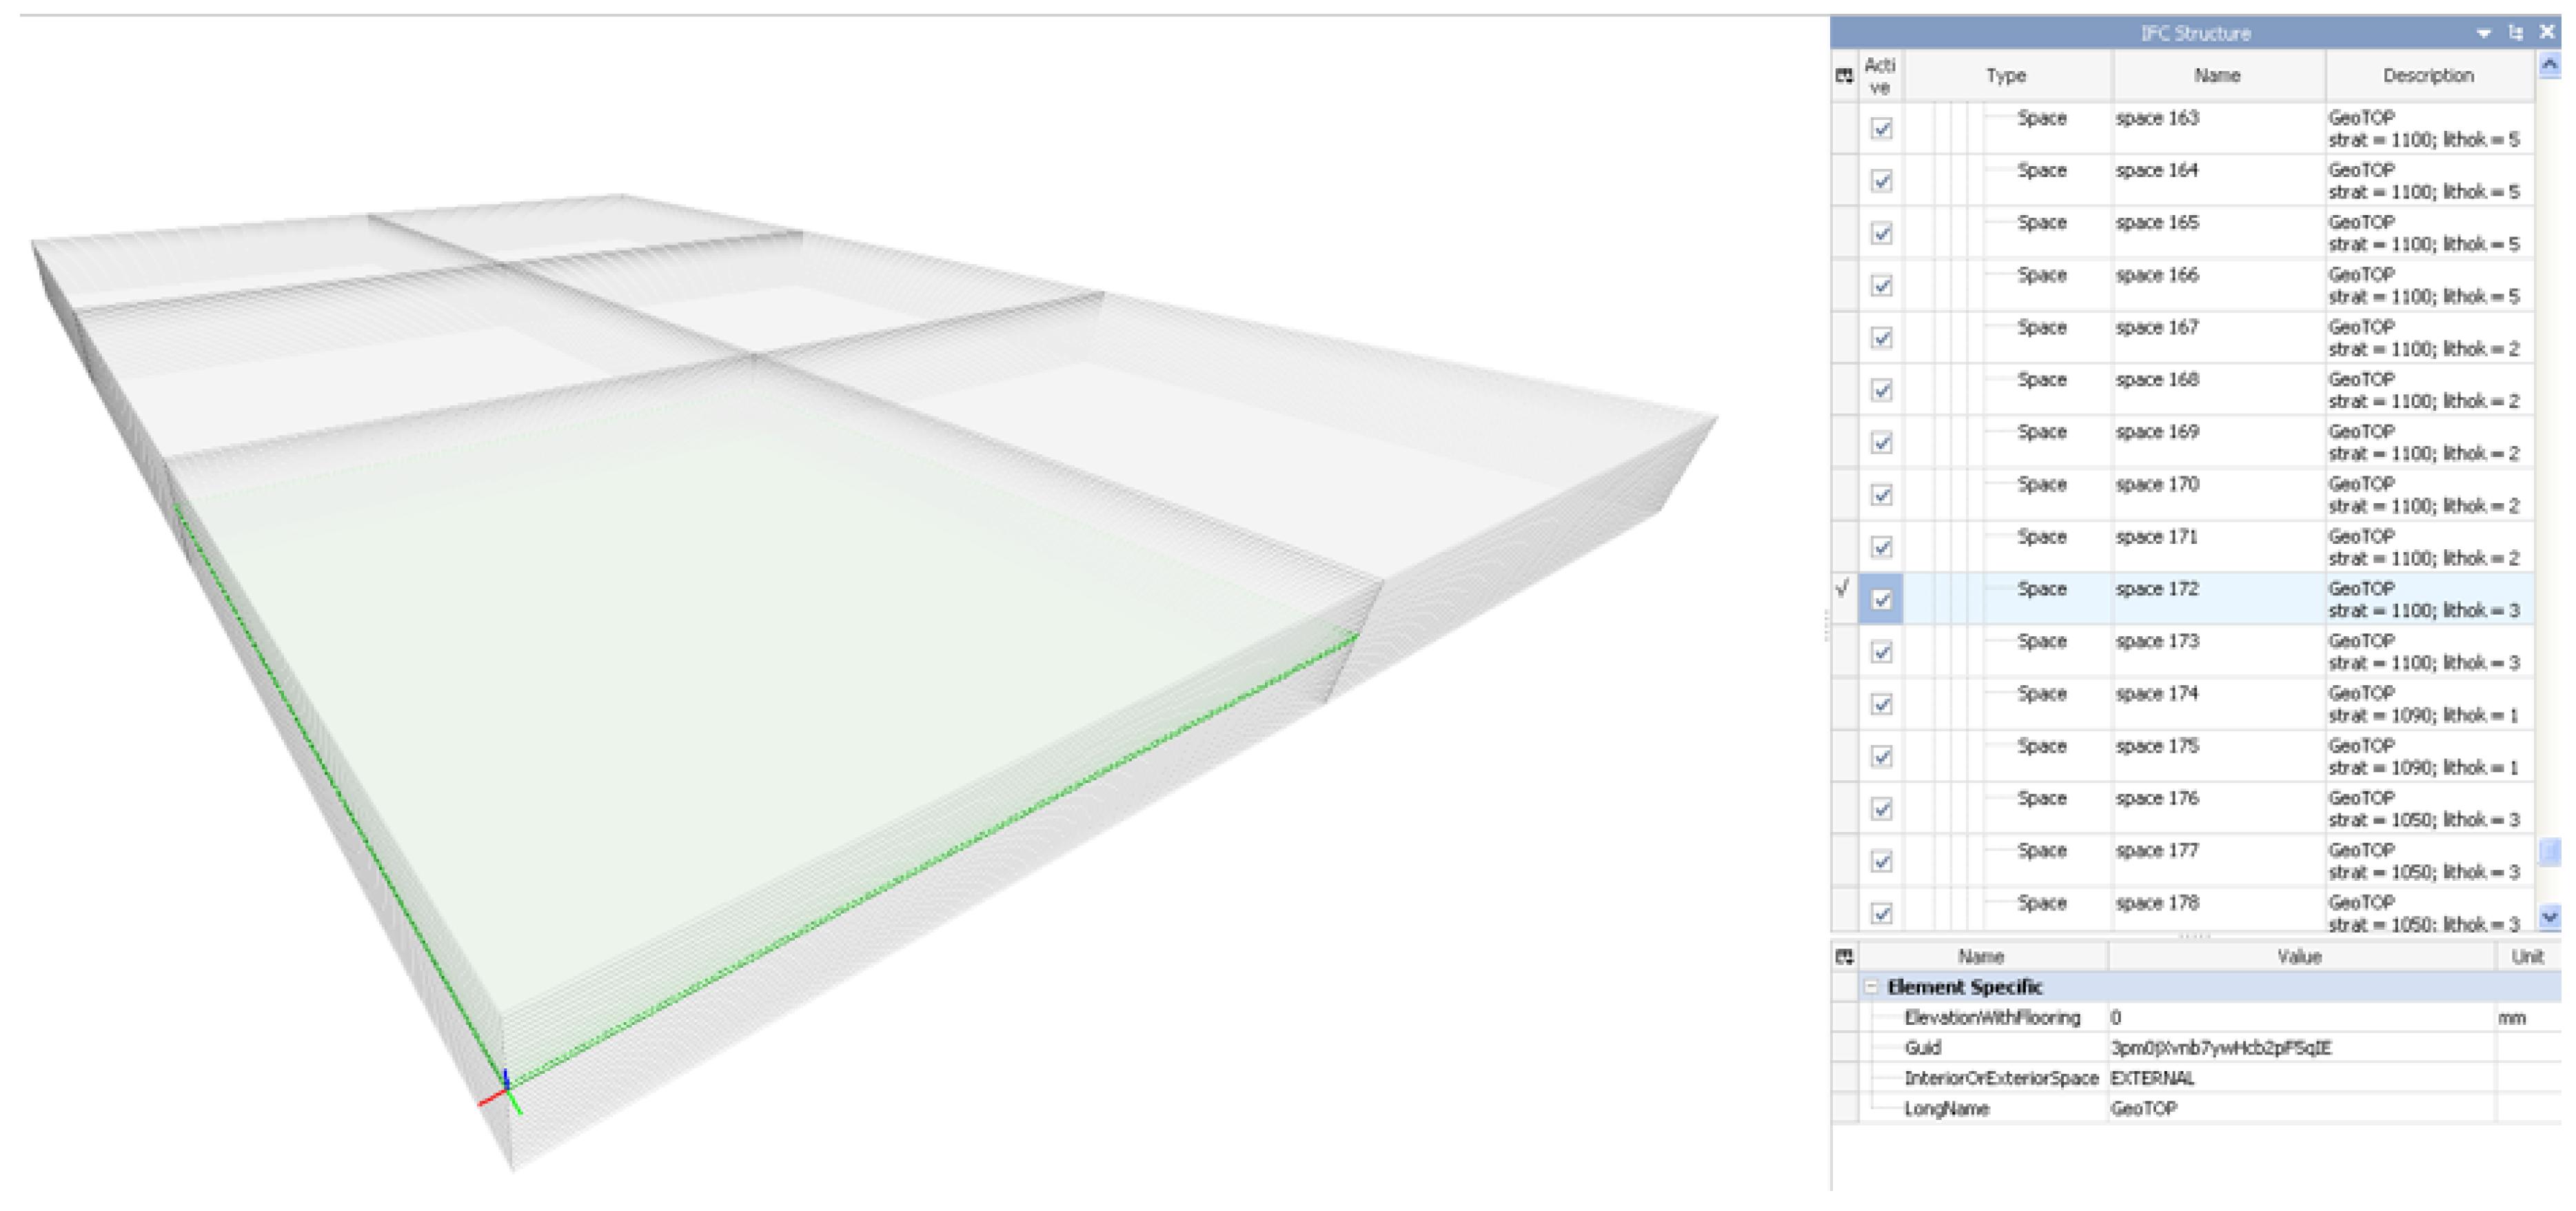 Screenshotssofashallow Foundation Analysis Software